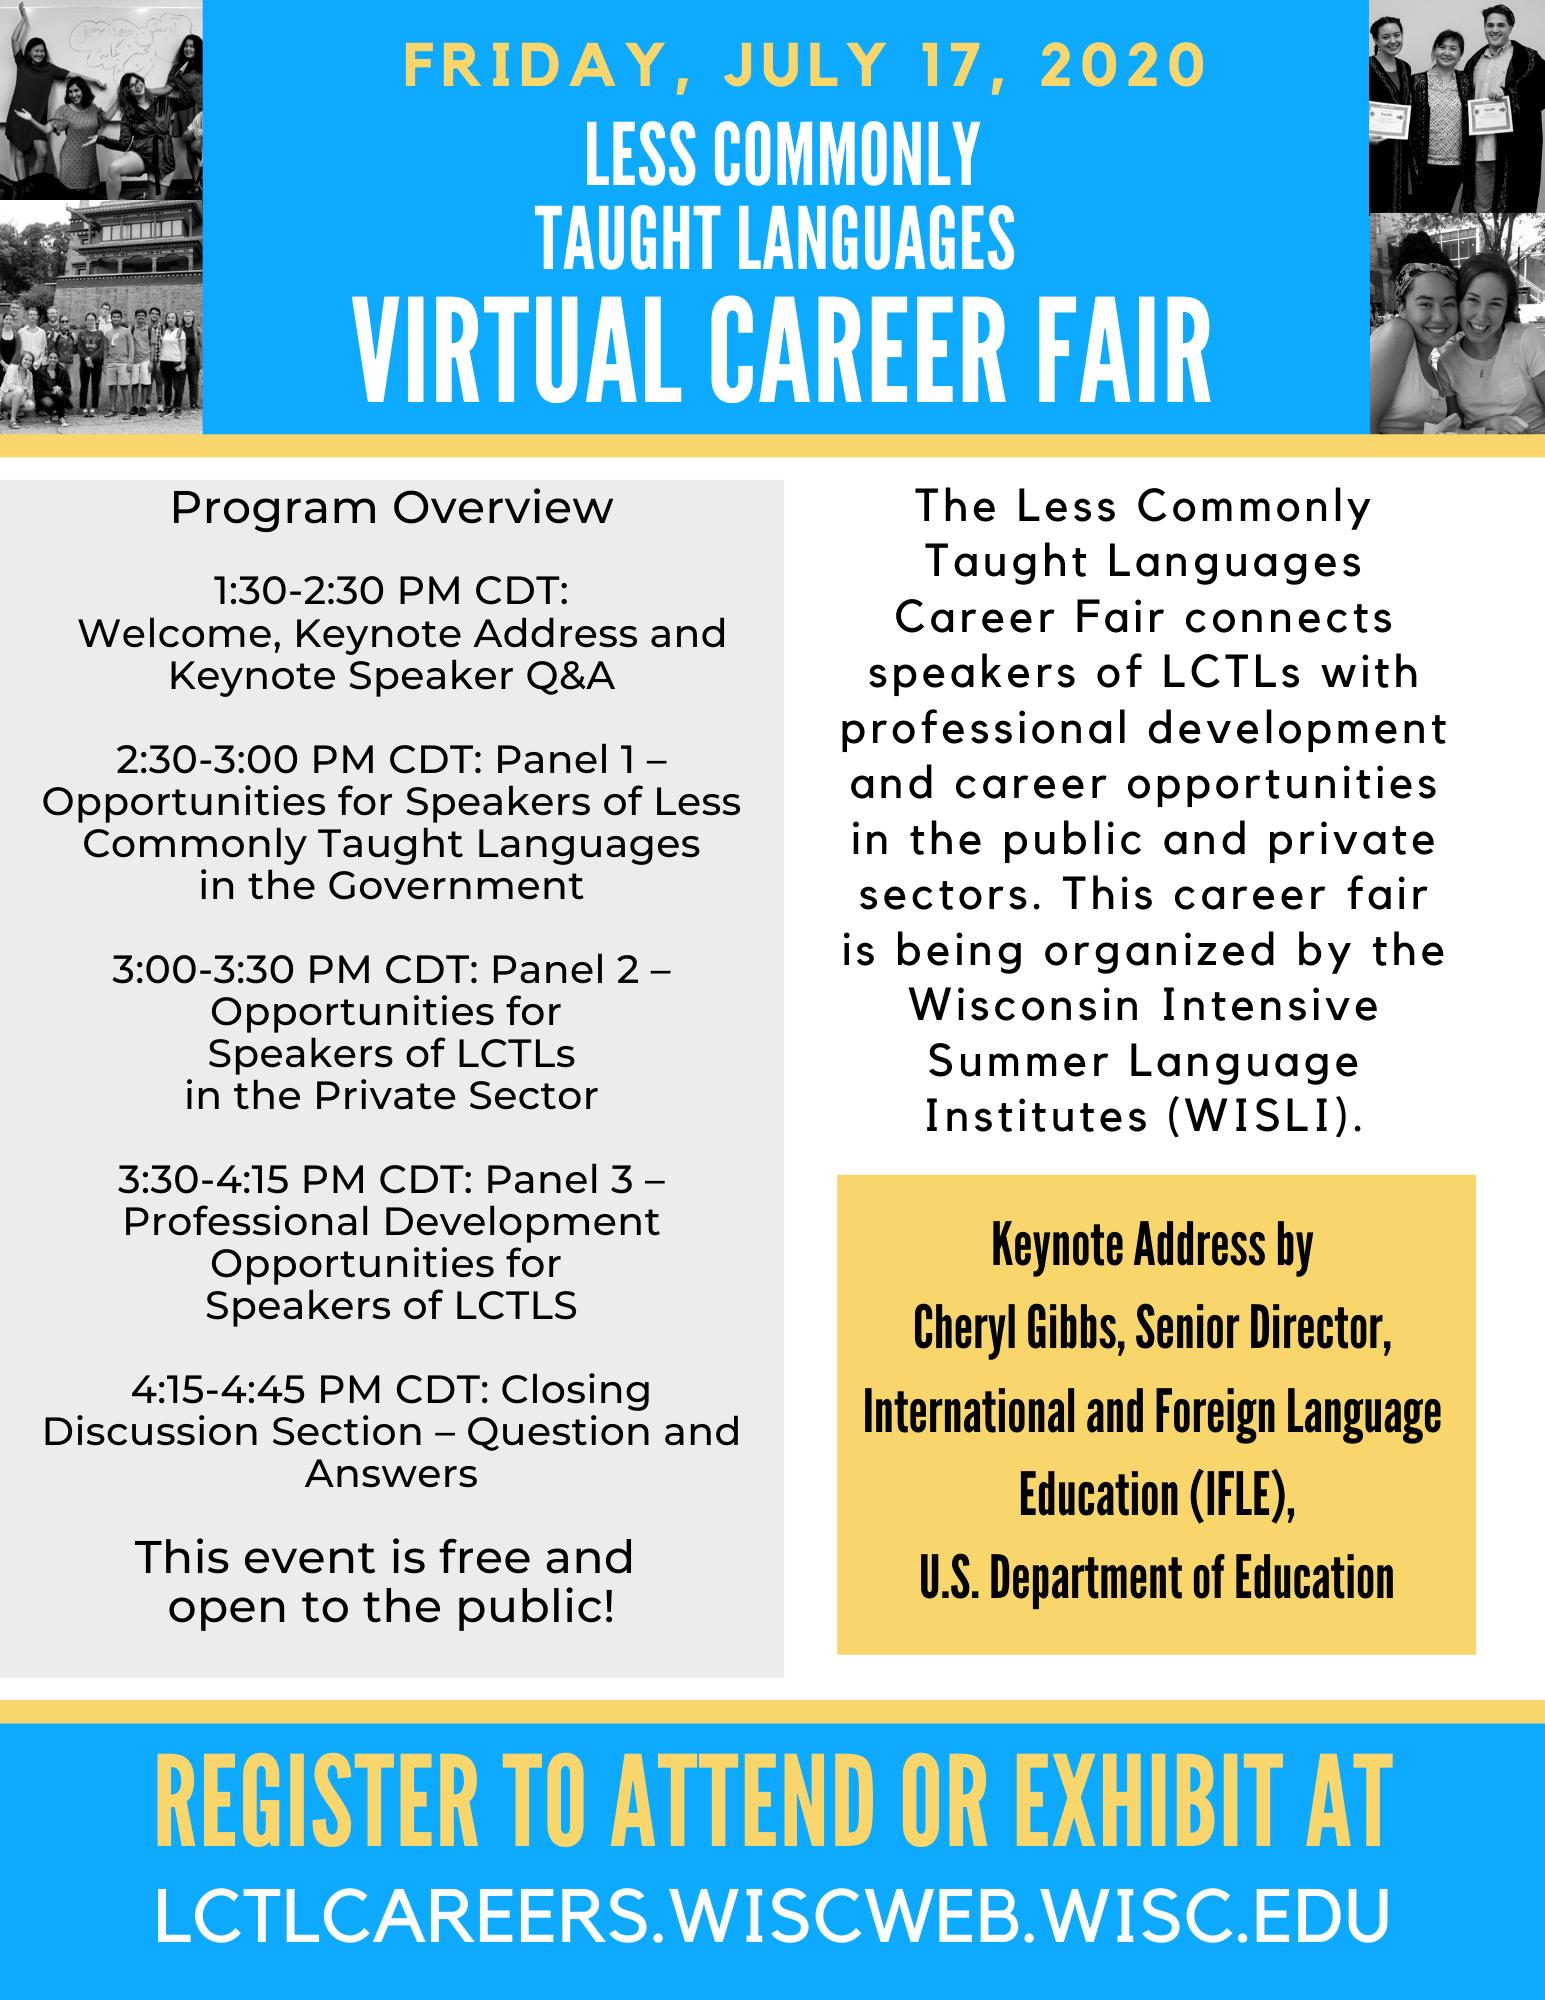 Updated LCTL Career Fair Schedule